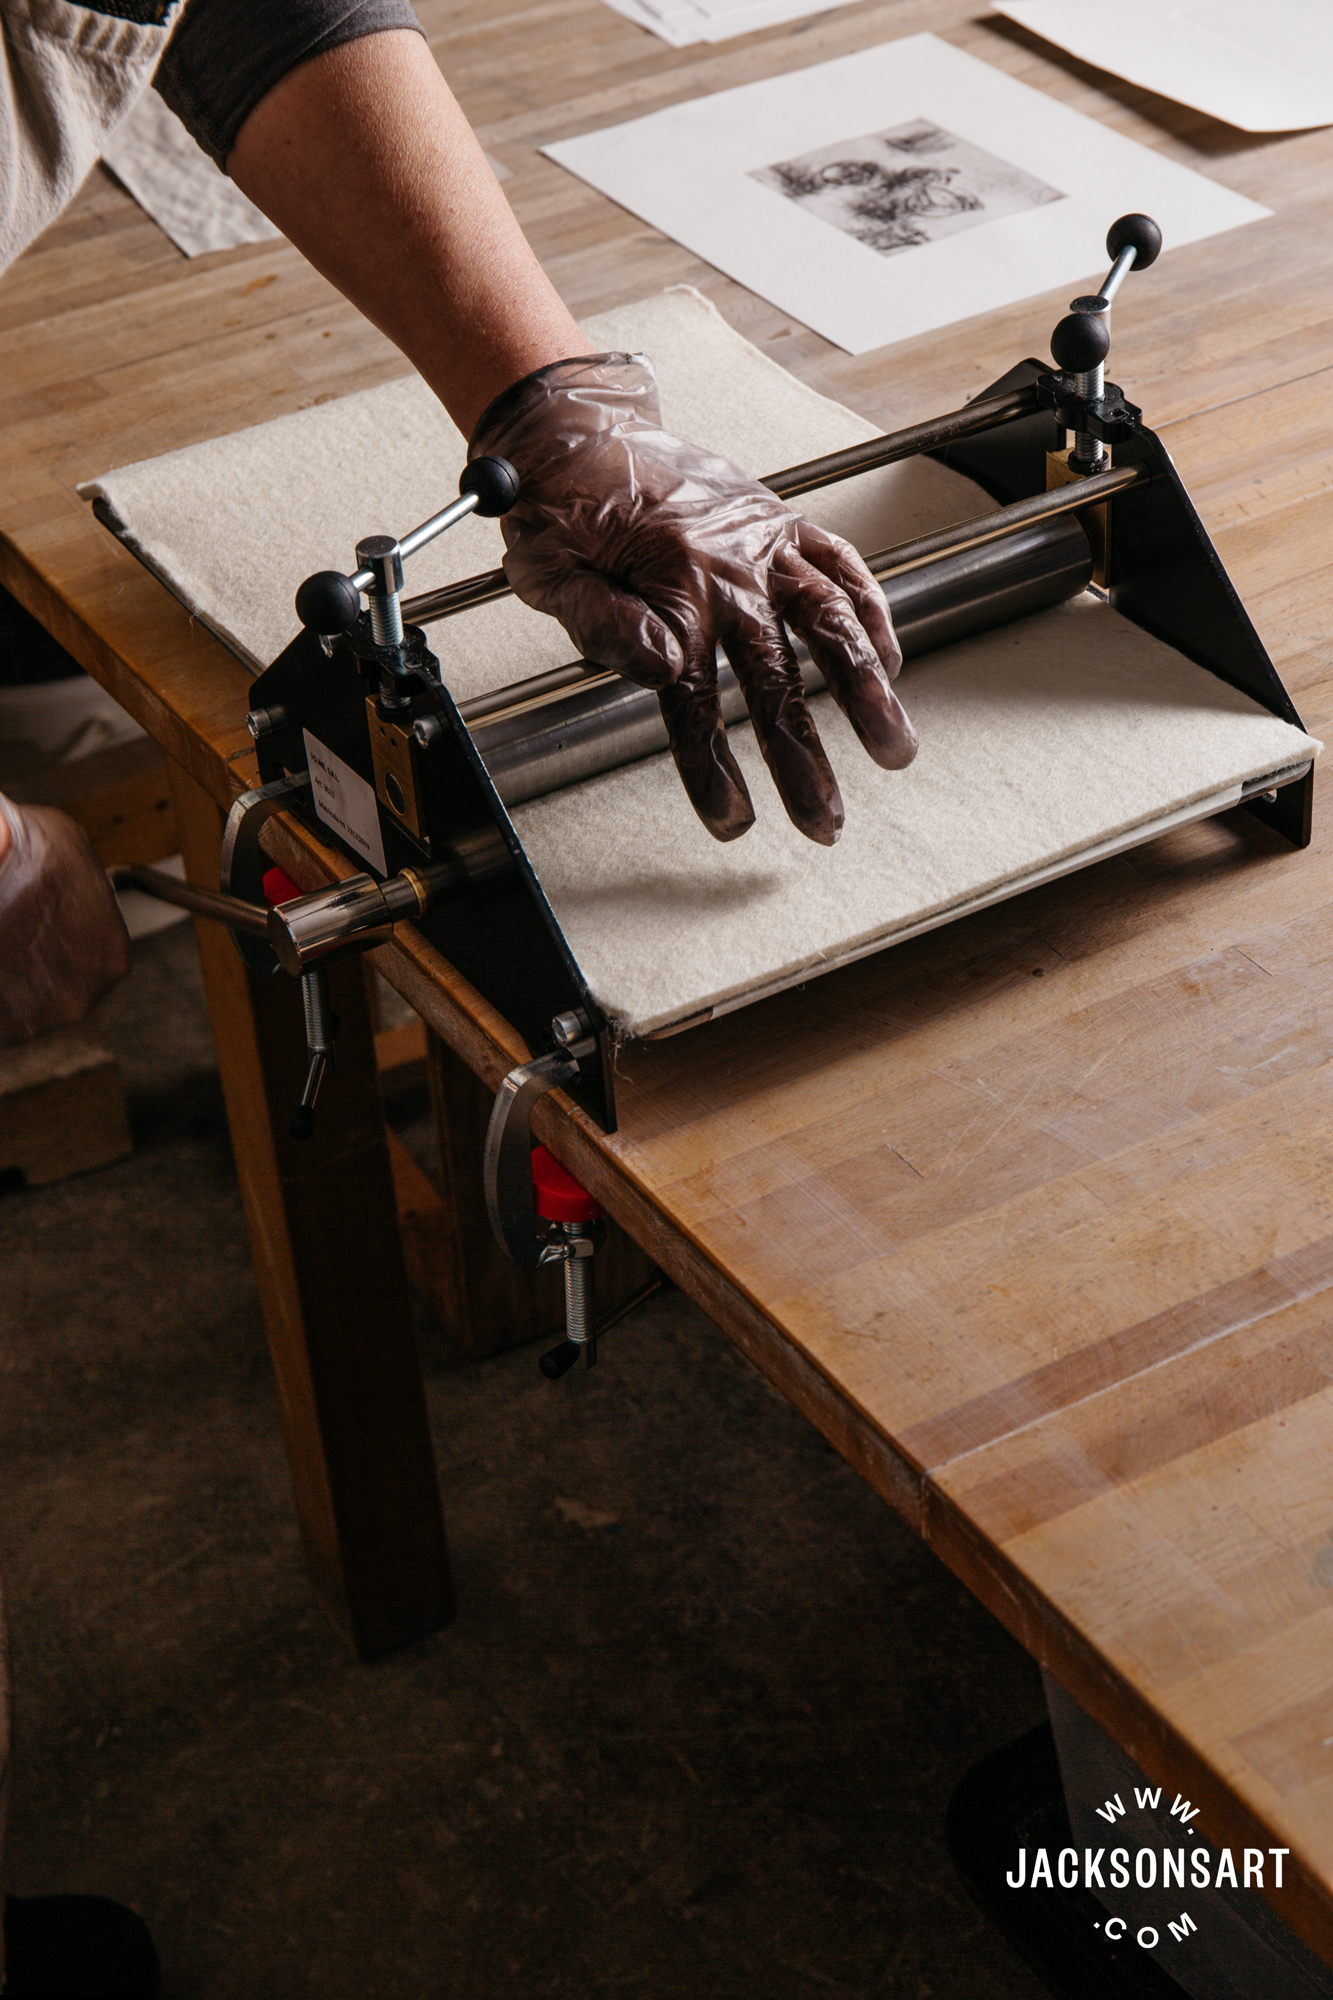 intaglio printing press